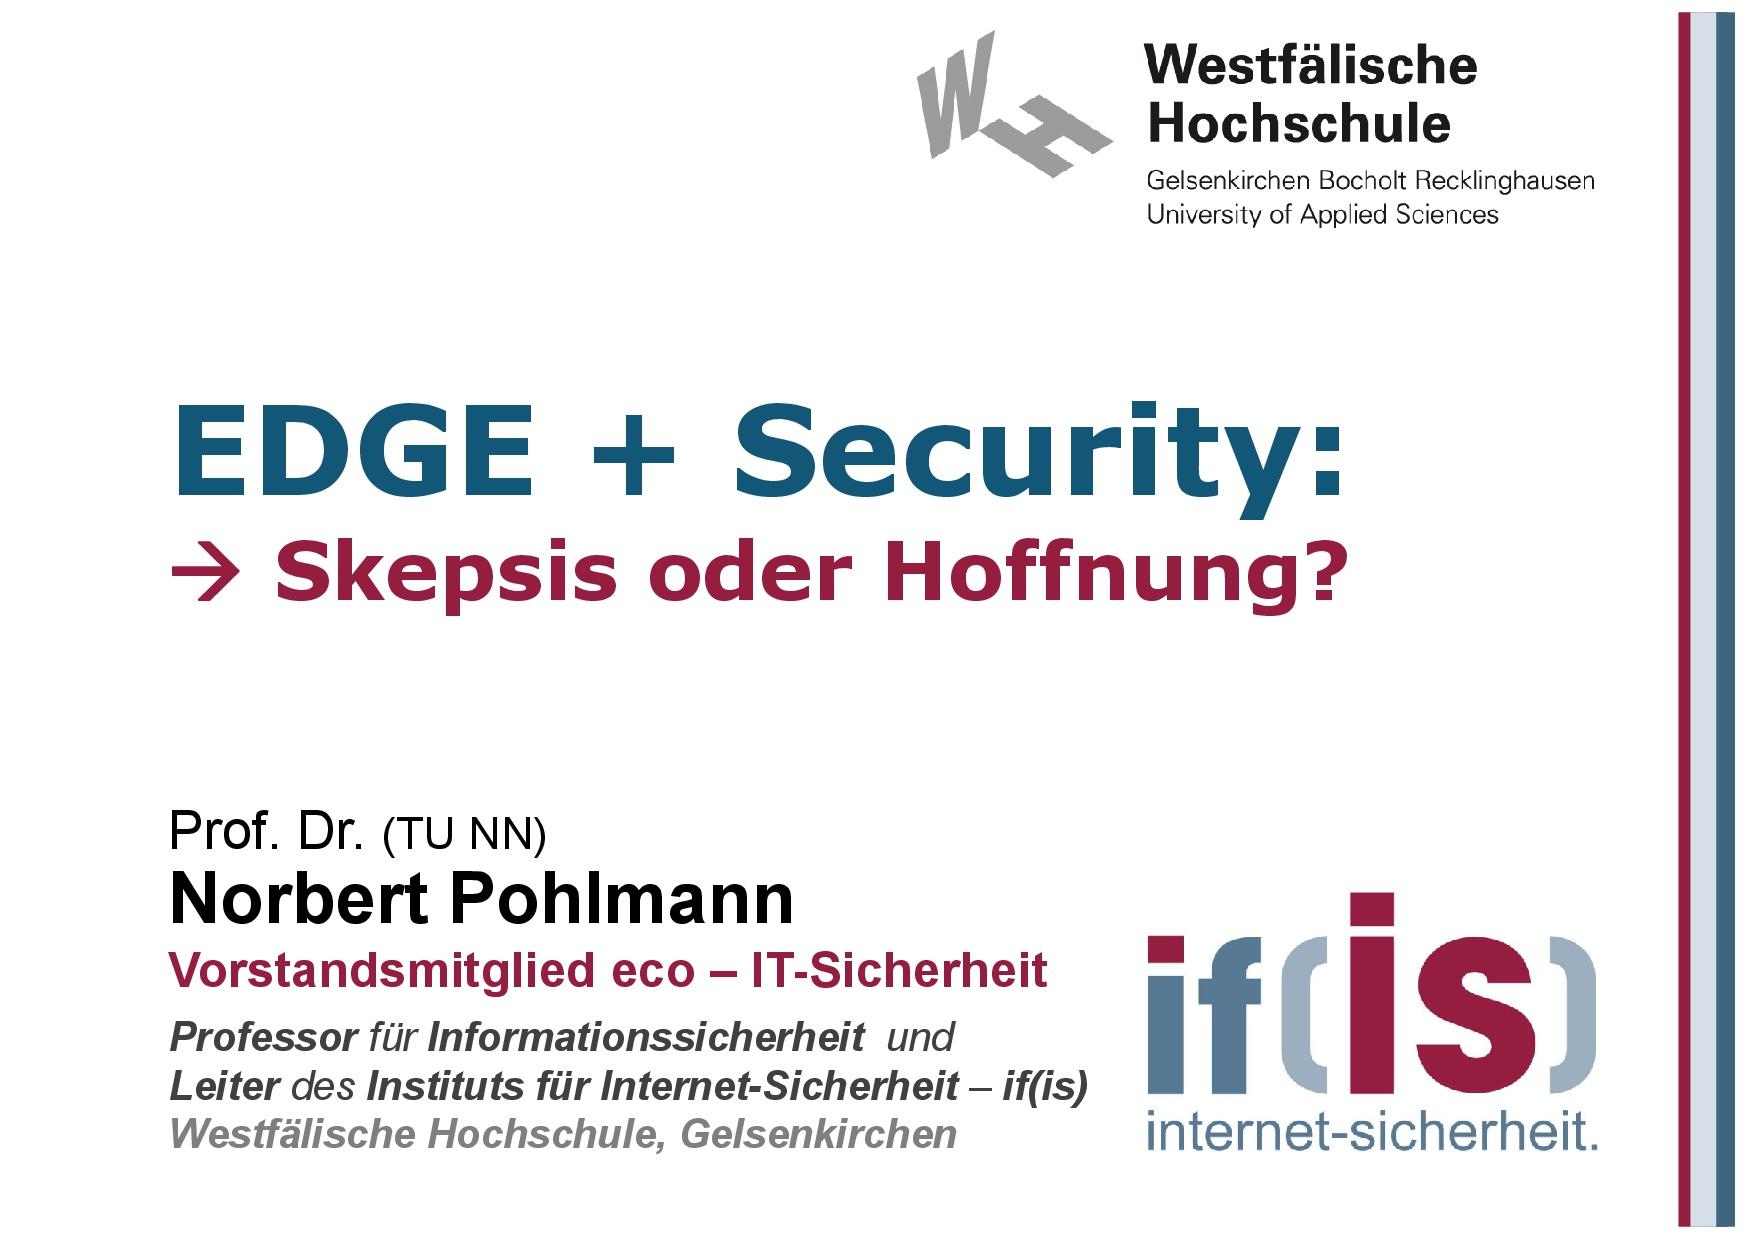 EDGE: Cloud-Continuum oder Revolution? - Prof. Norbert Pohlmann